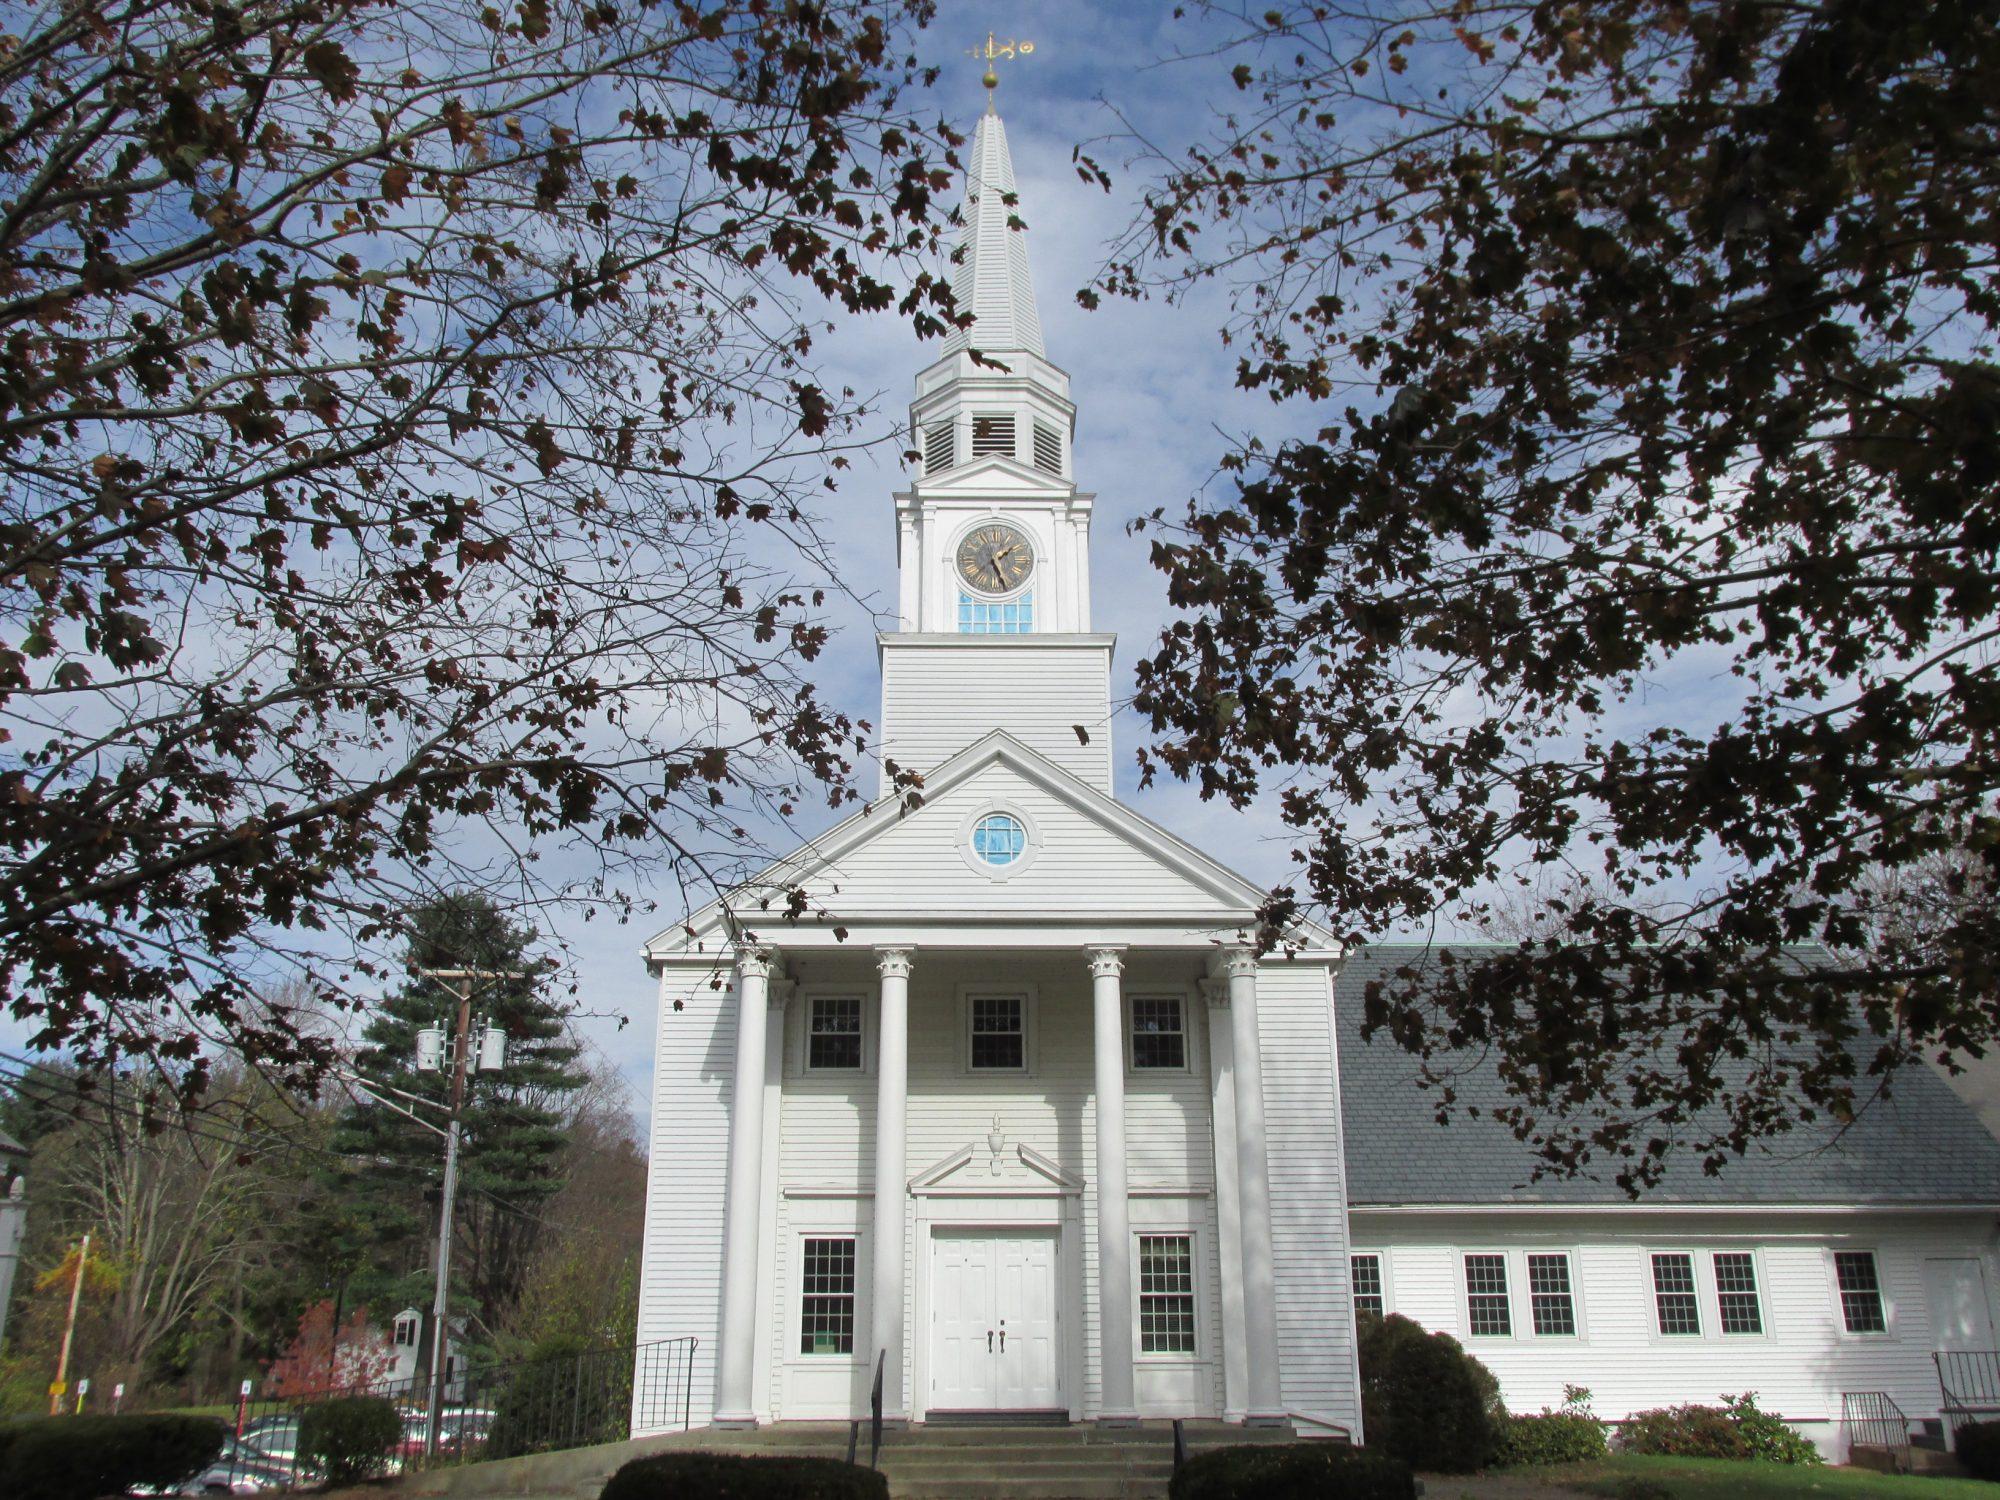 Sturbridge Federated Church